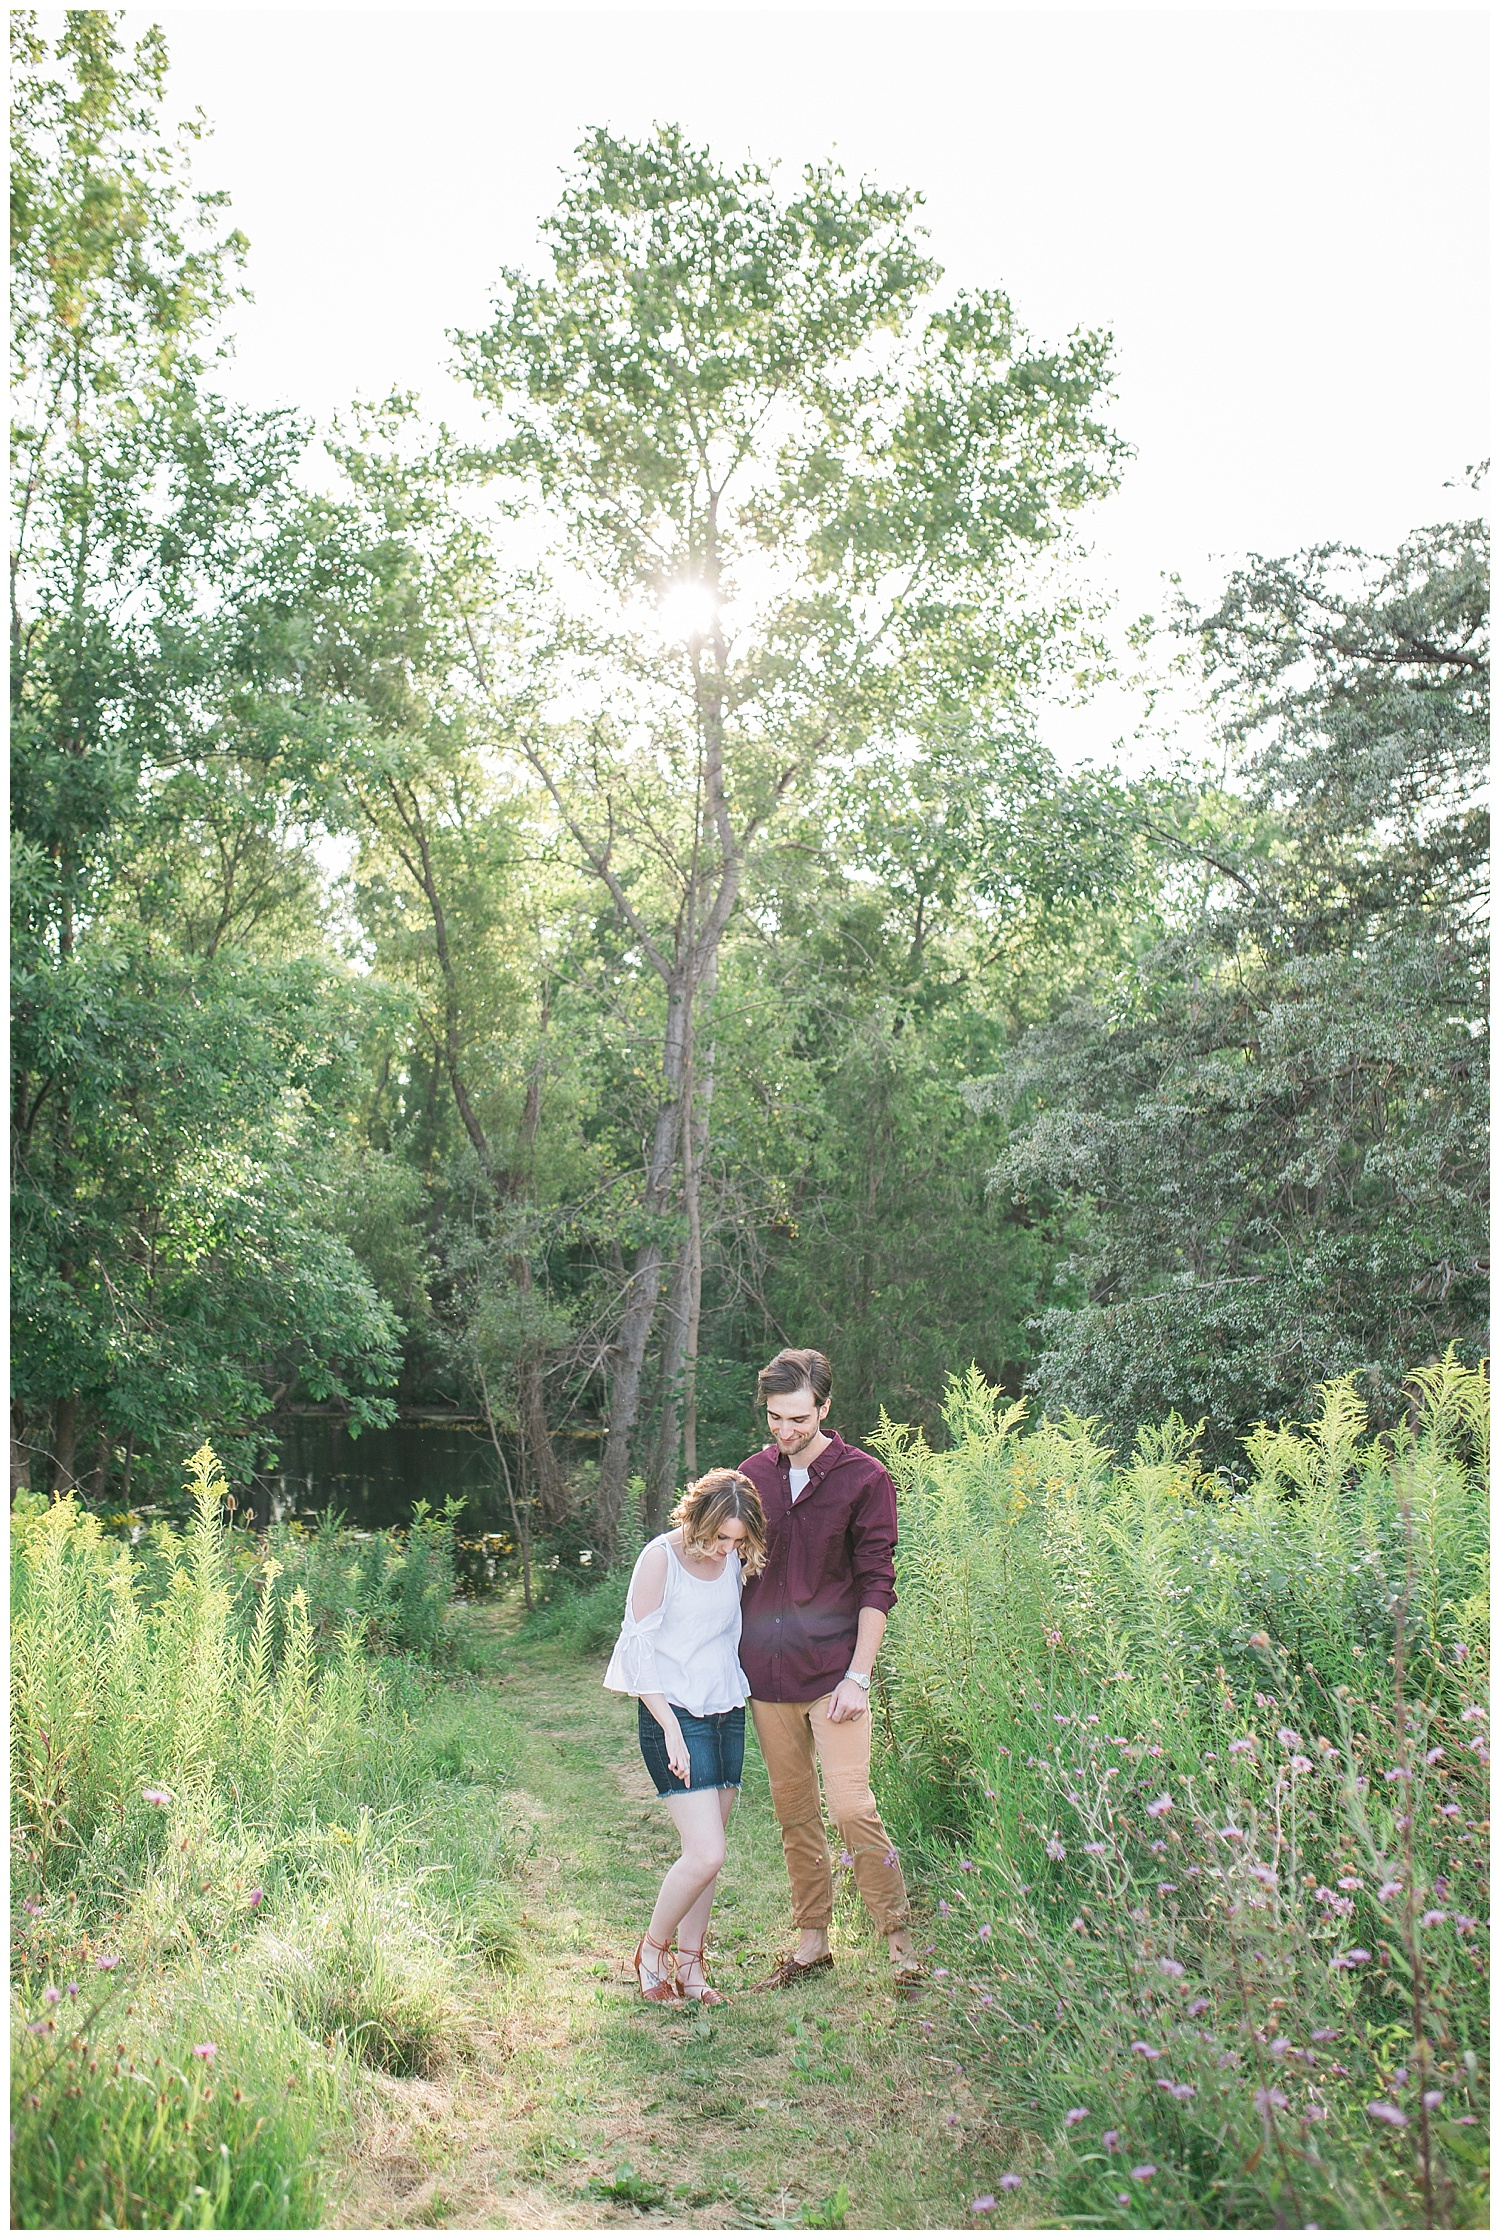 Tanya and Ryan - Sweetheart session - Lass & Beau - Geneseo NY-115_Buffalo wedding photography.jpg